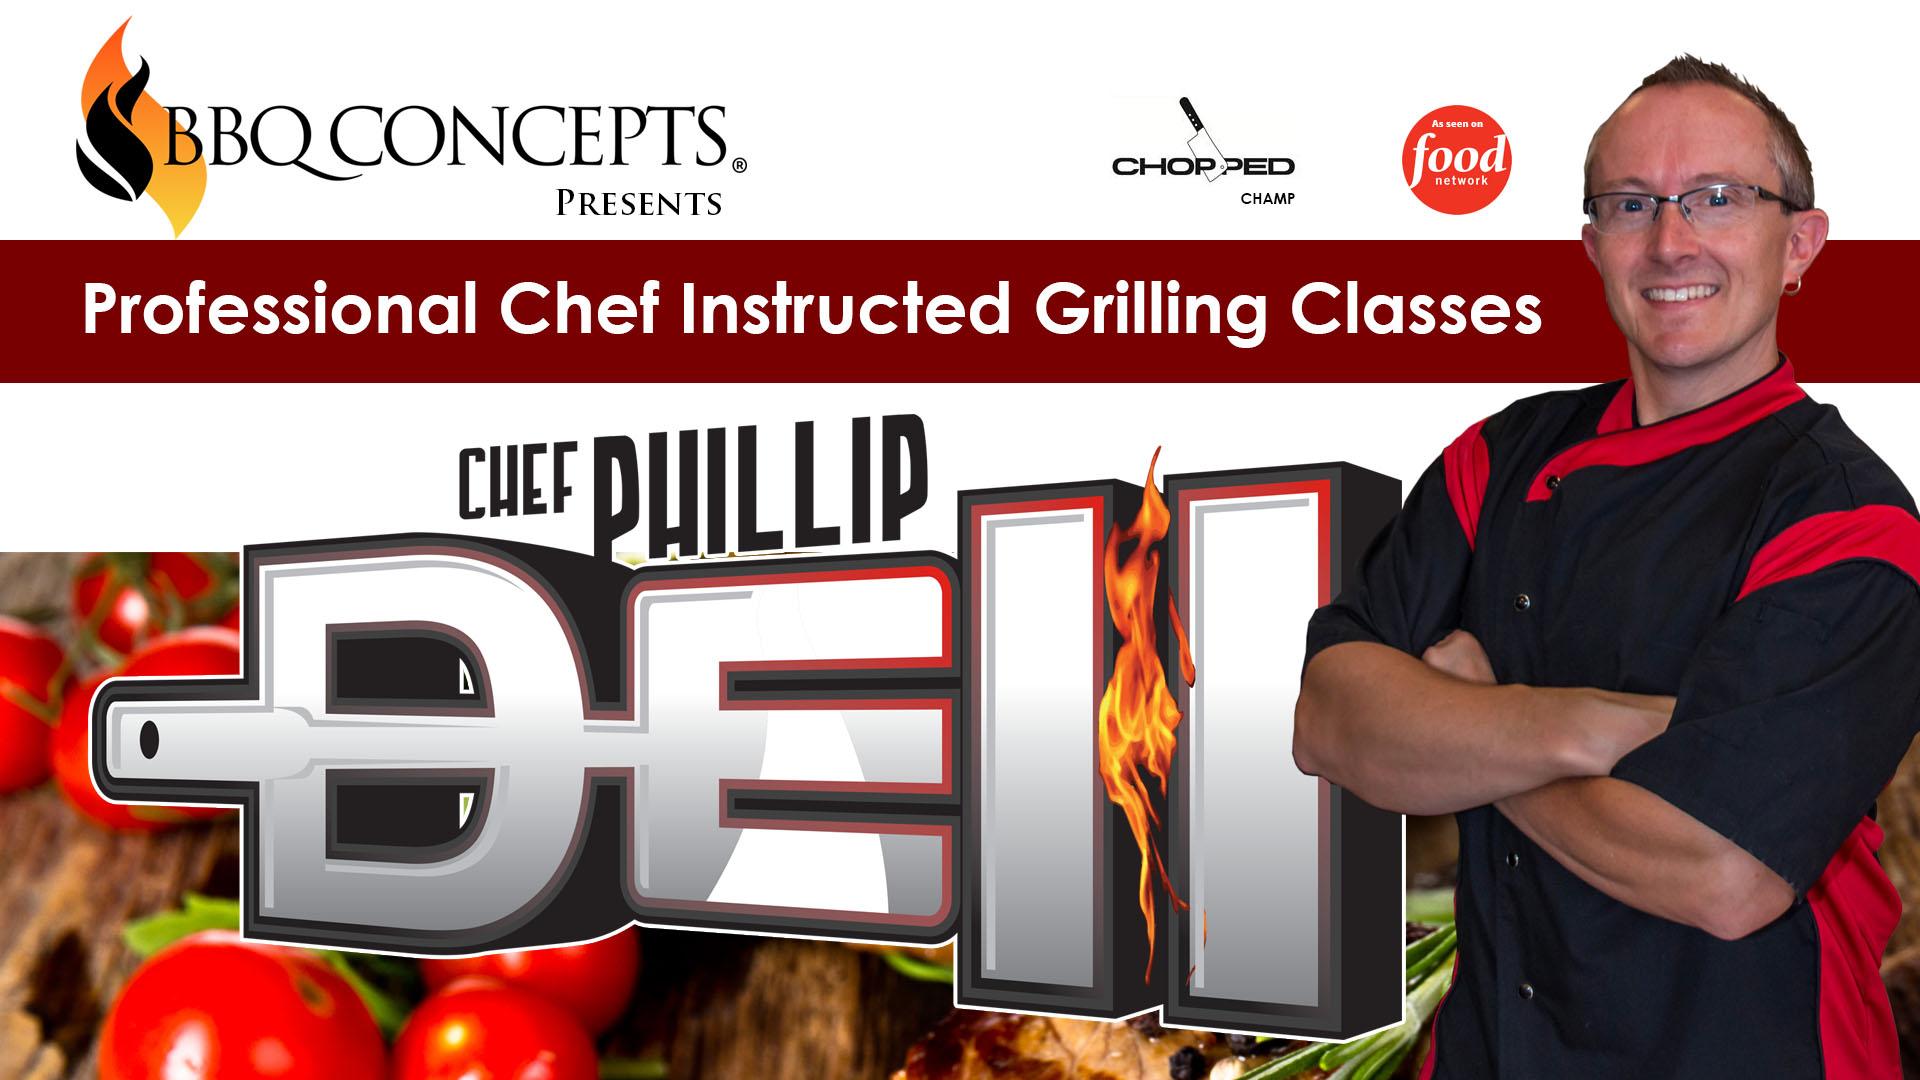 BBQ Concepts - Chef Dell Promo - Cooking Classes